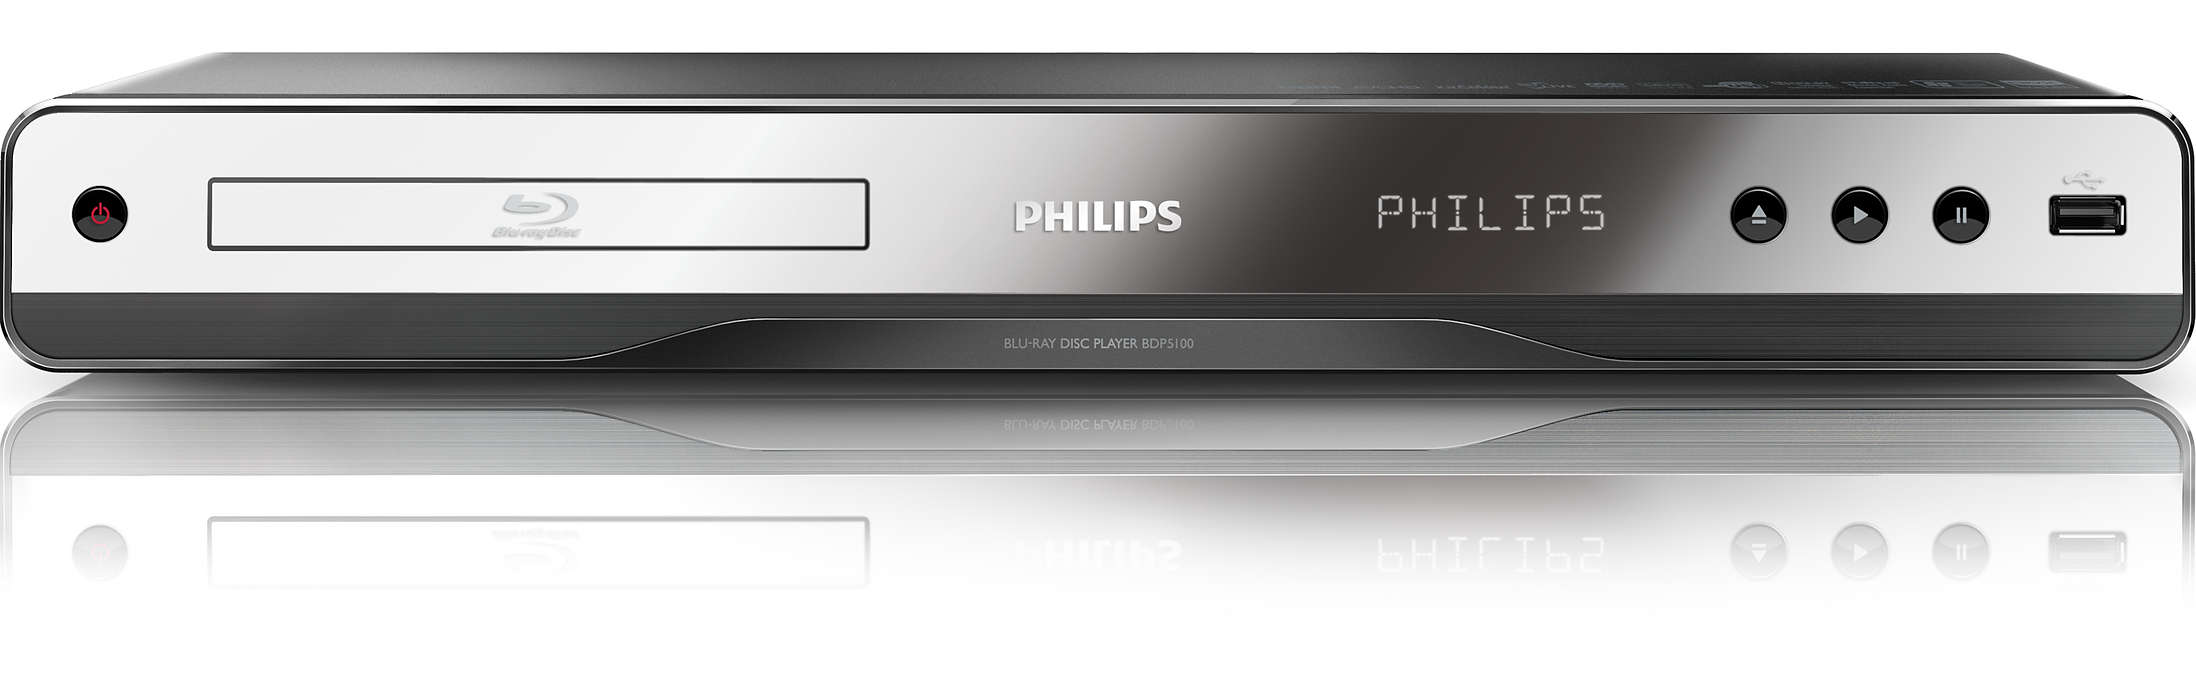 Desfrute de Blu-ray e dos seus vídeos de PC preferidos.